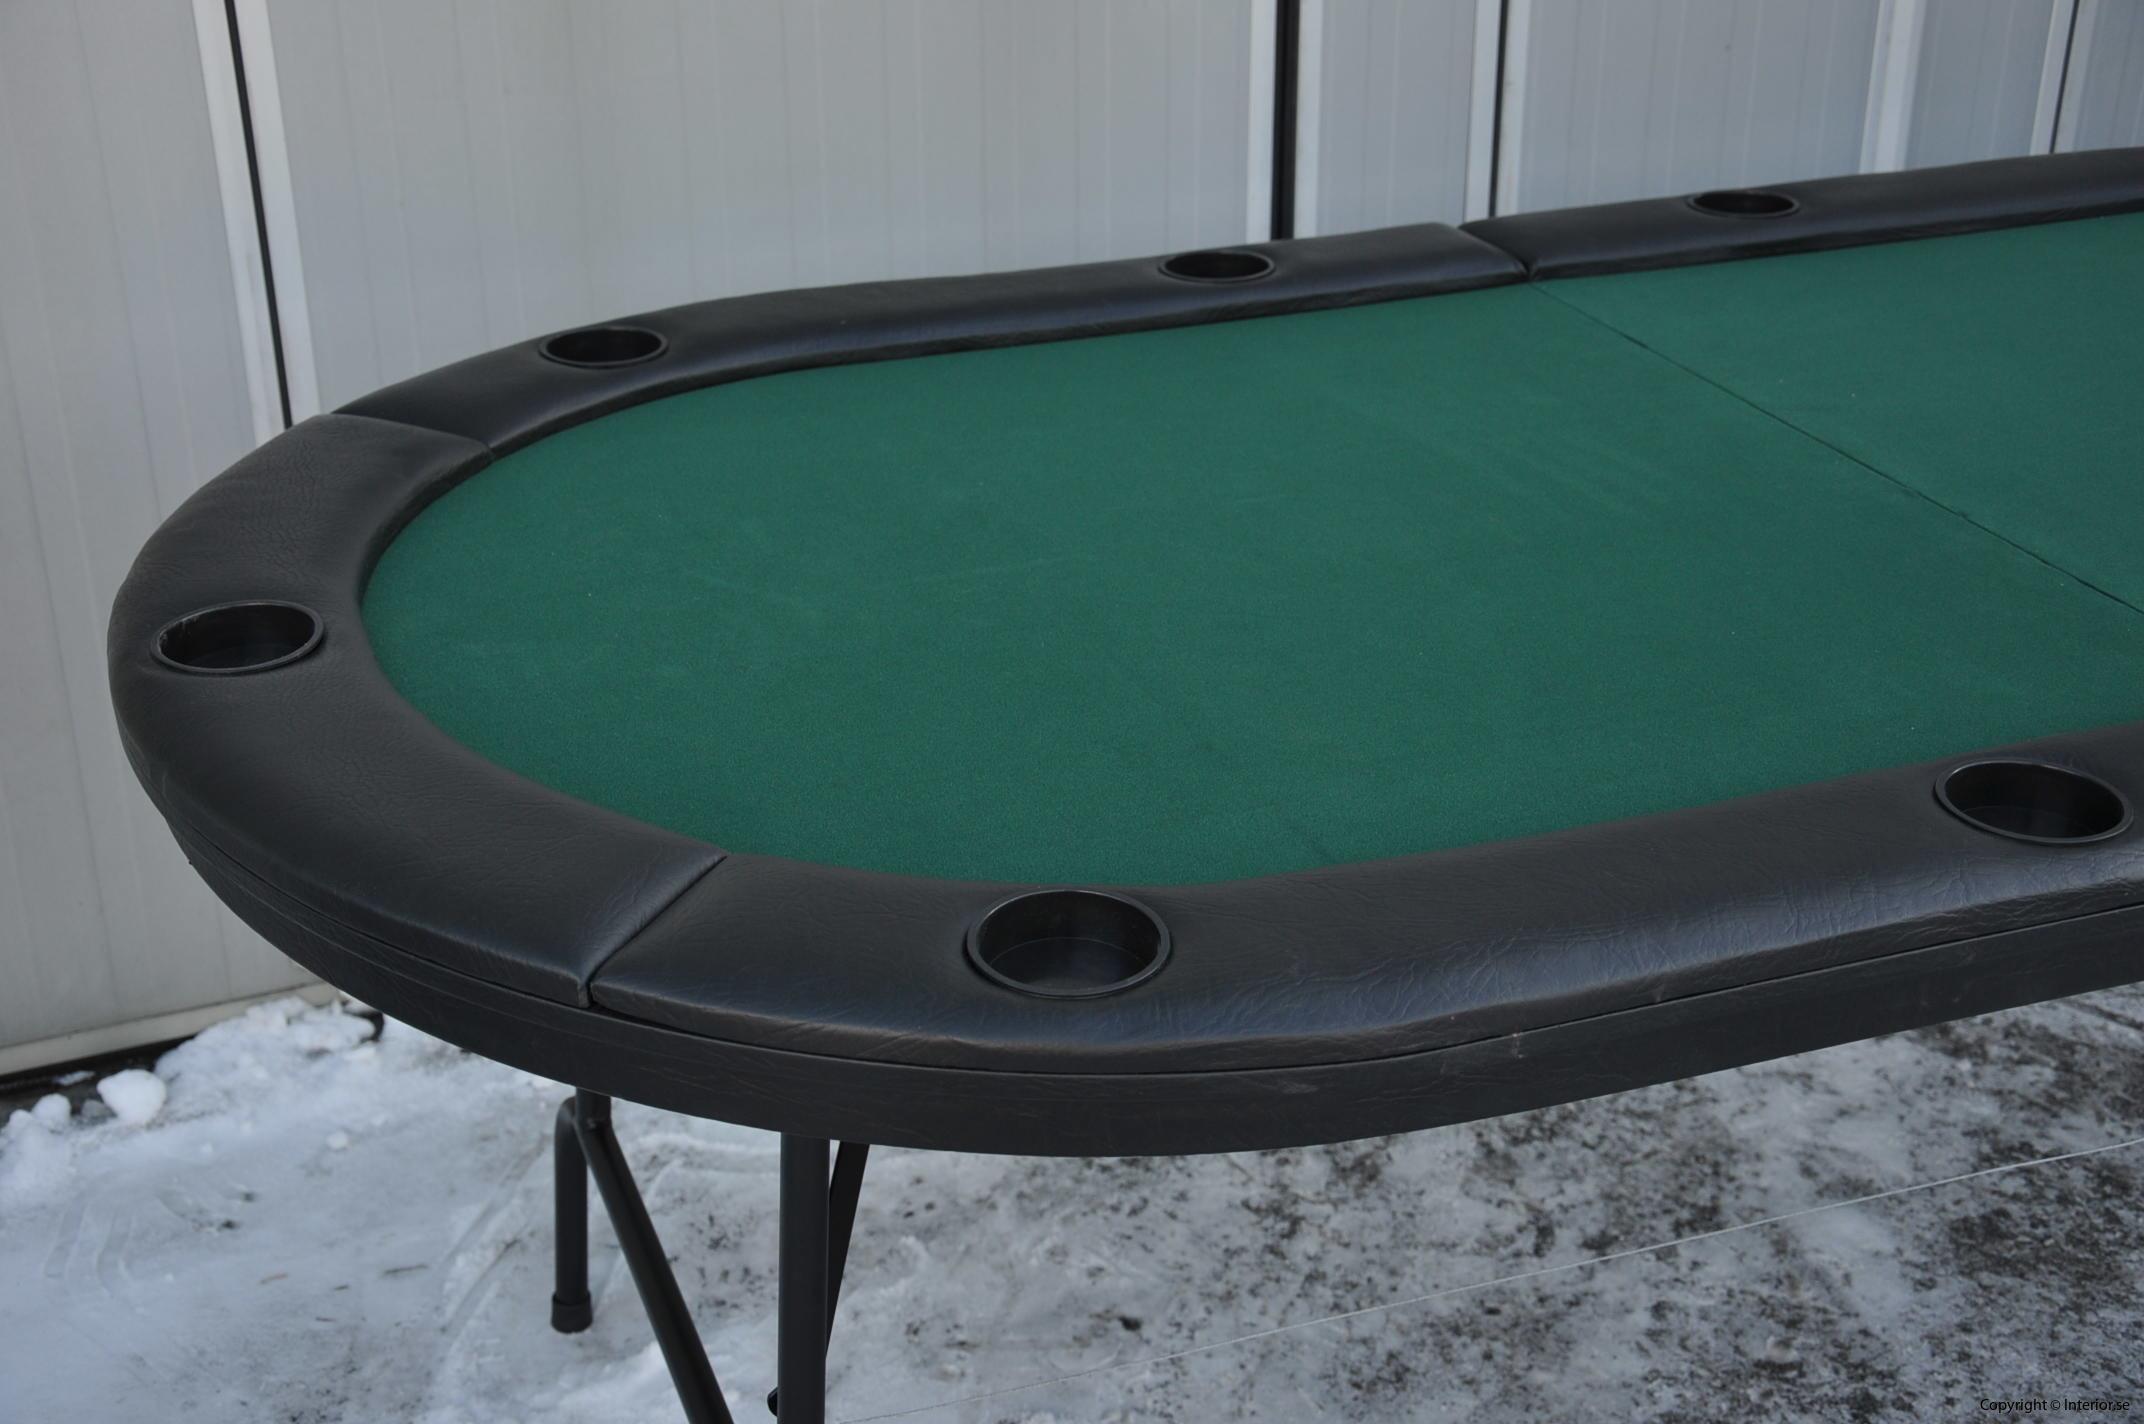 Hyra spelbord hyr pokerbord texas hold em blackjack pokerbord stockholm hyra spel